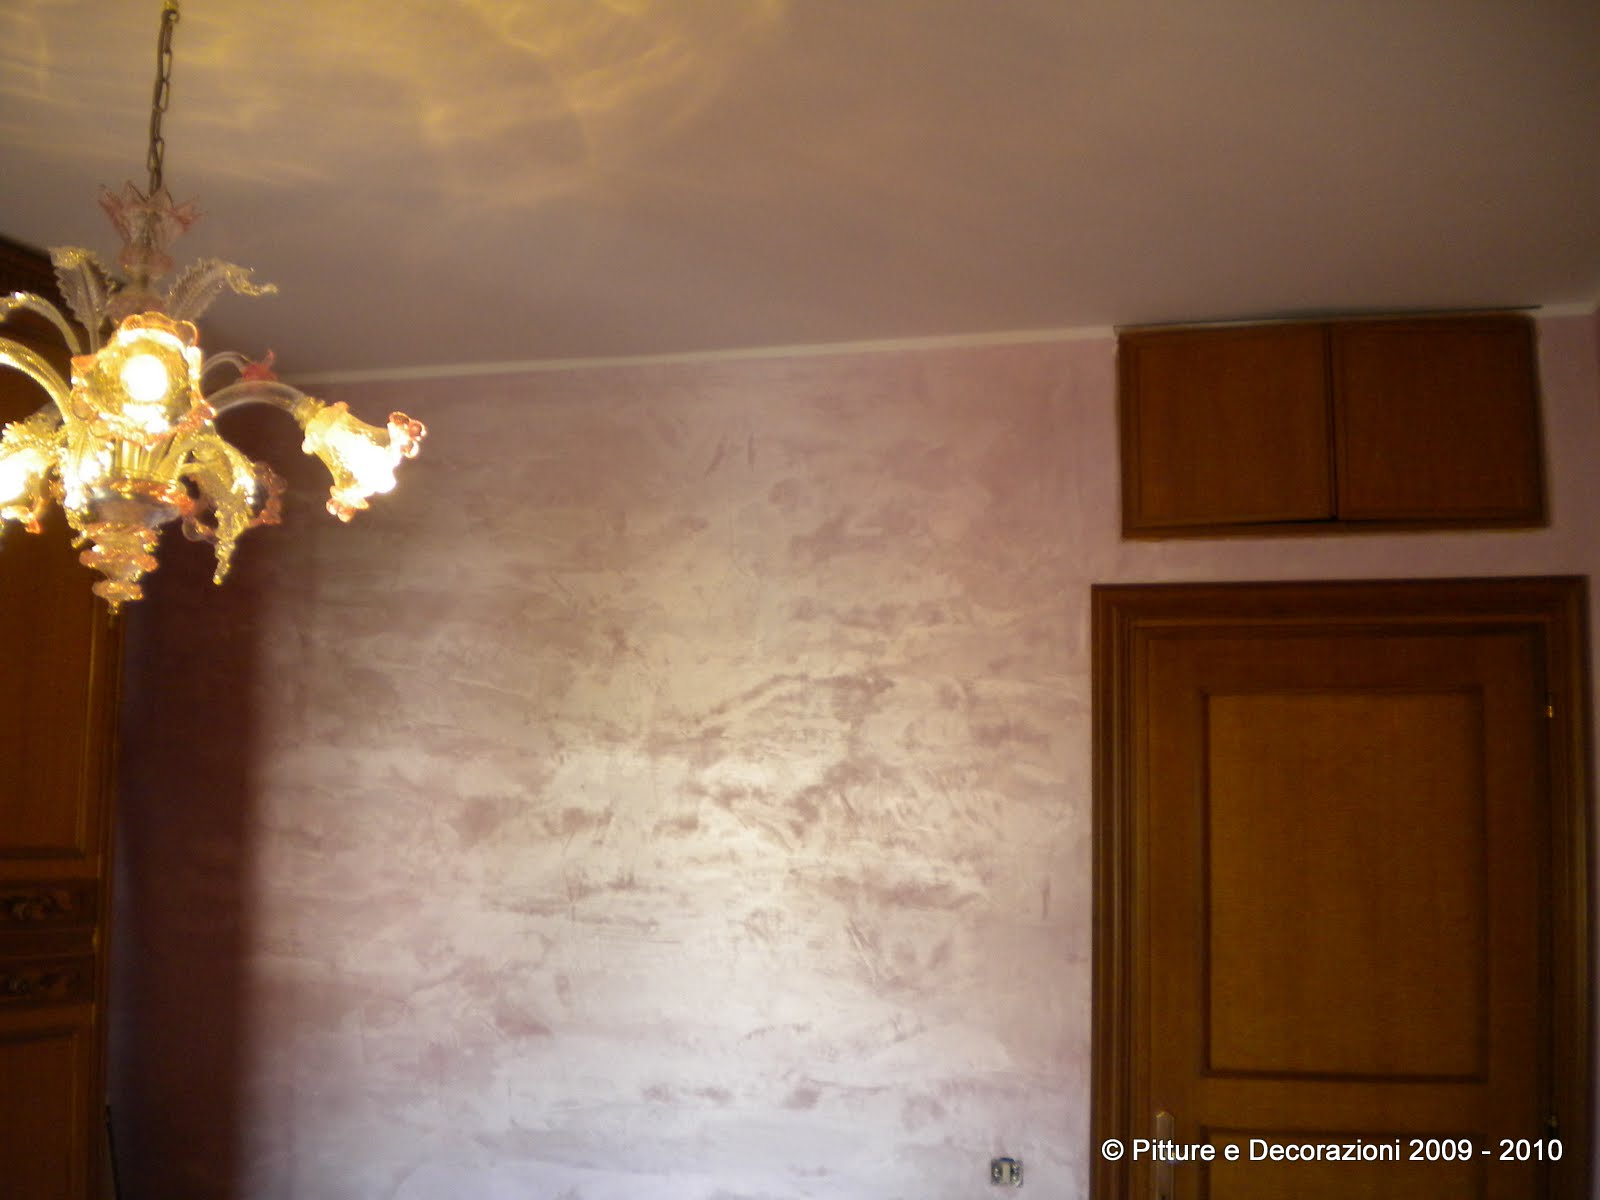 Prezzi Pittura Per Interni. Amazing Best Pittura Muri Interni Prezzi Pitture Decorative Per ...